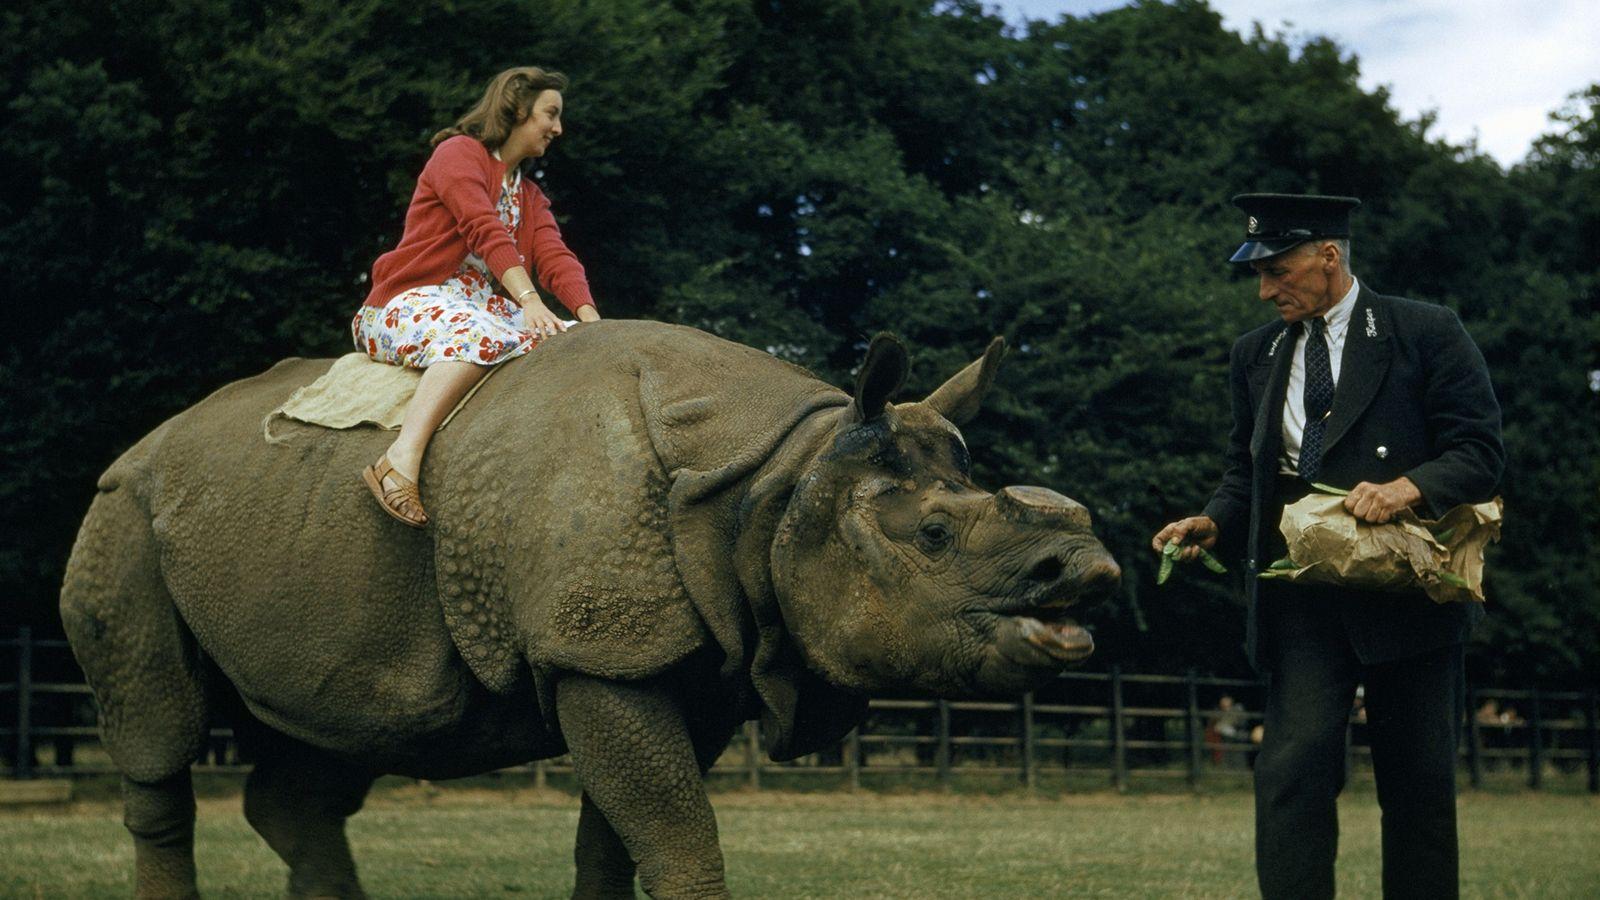 carona no rinoceronte